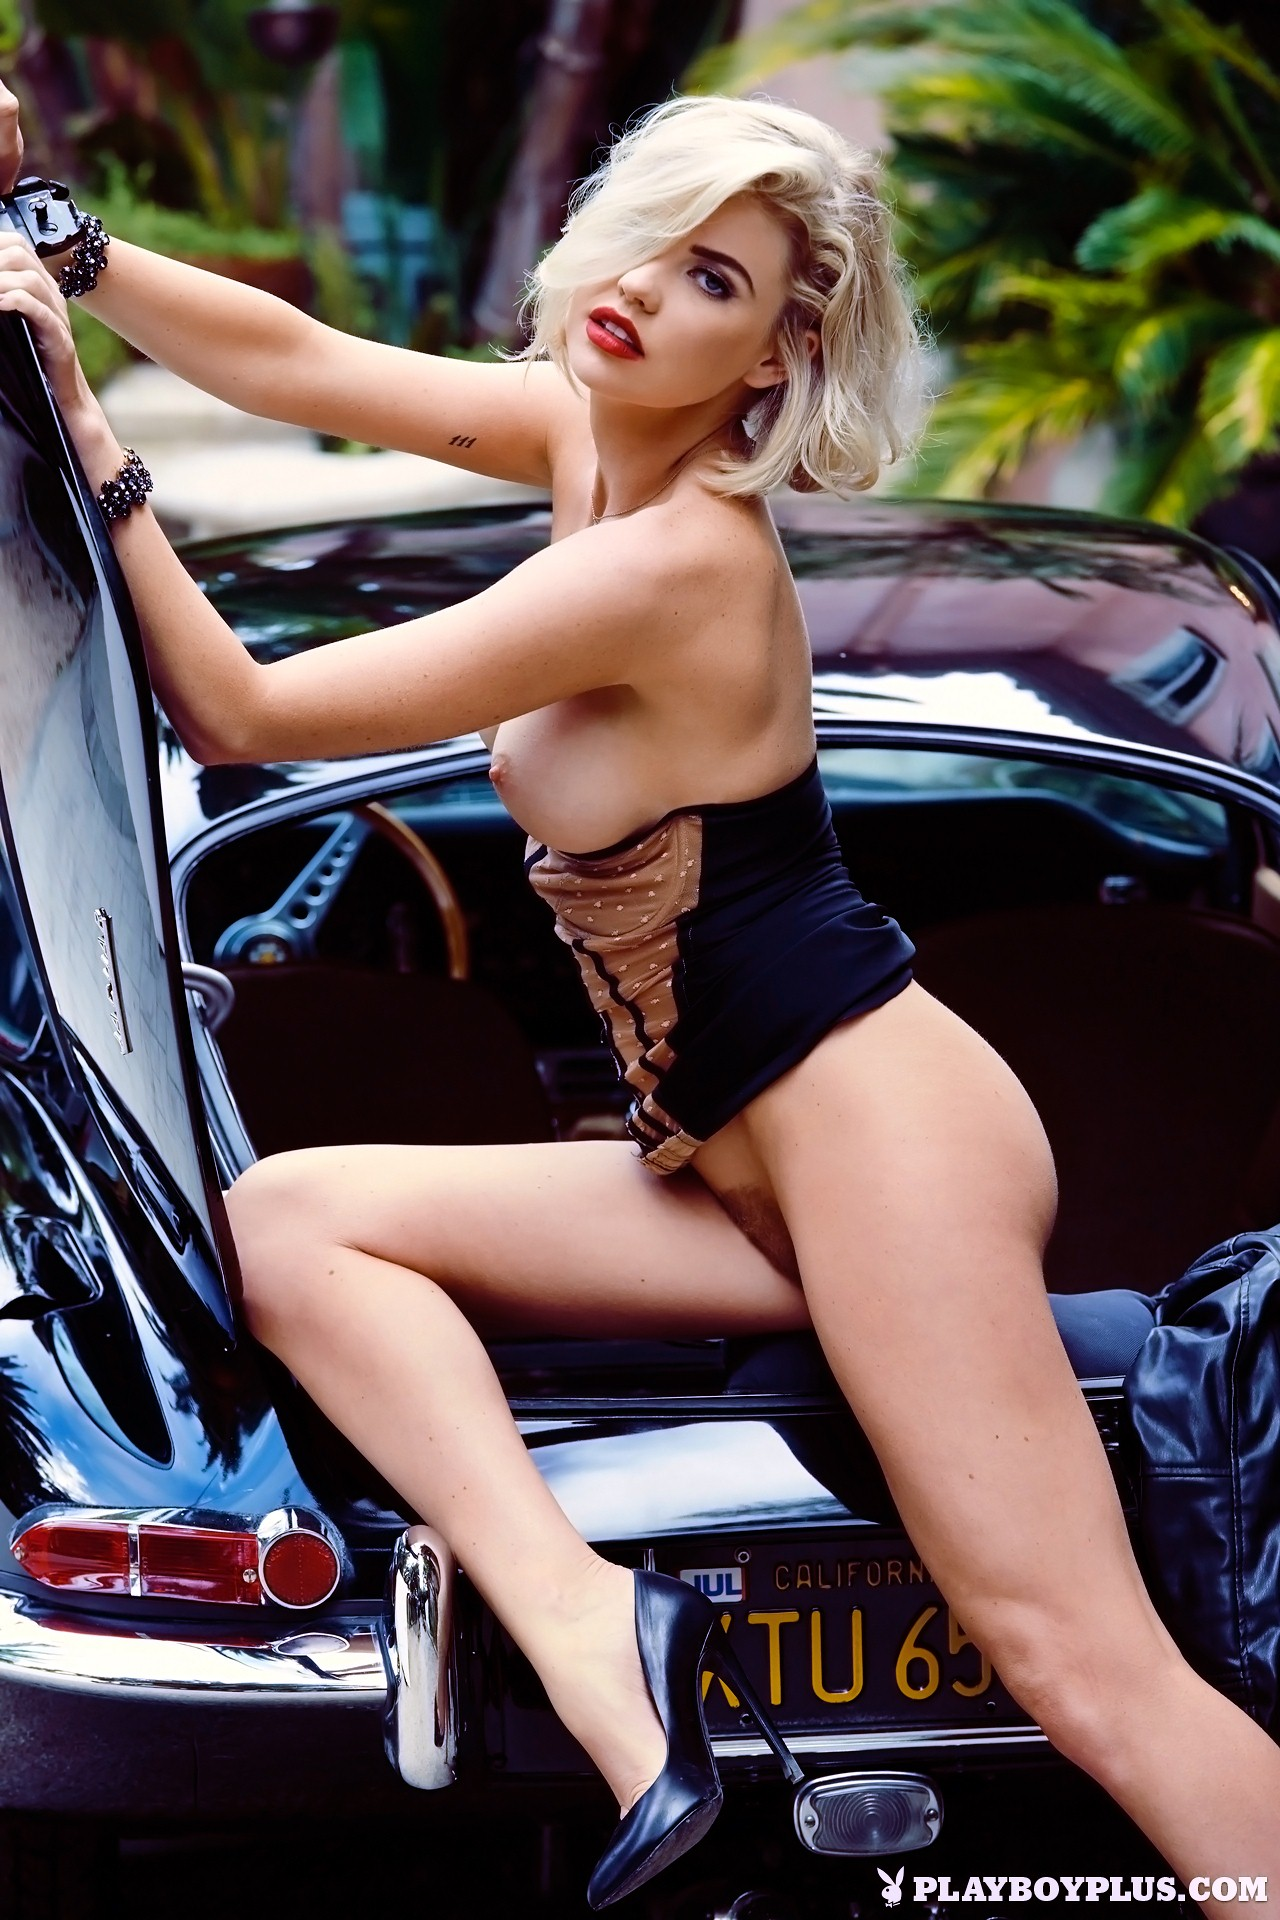 Sherlyn chopra nude playboy photoshoot-8869